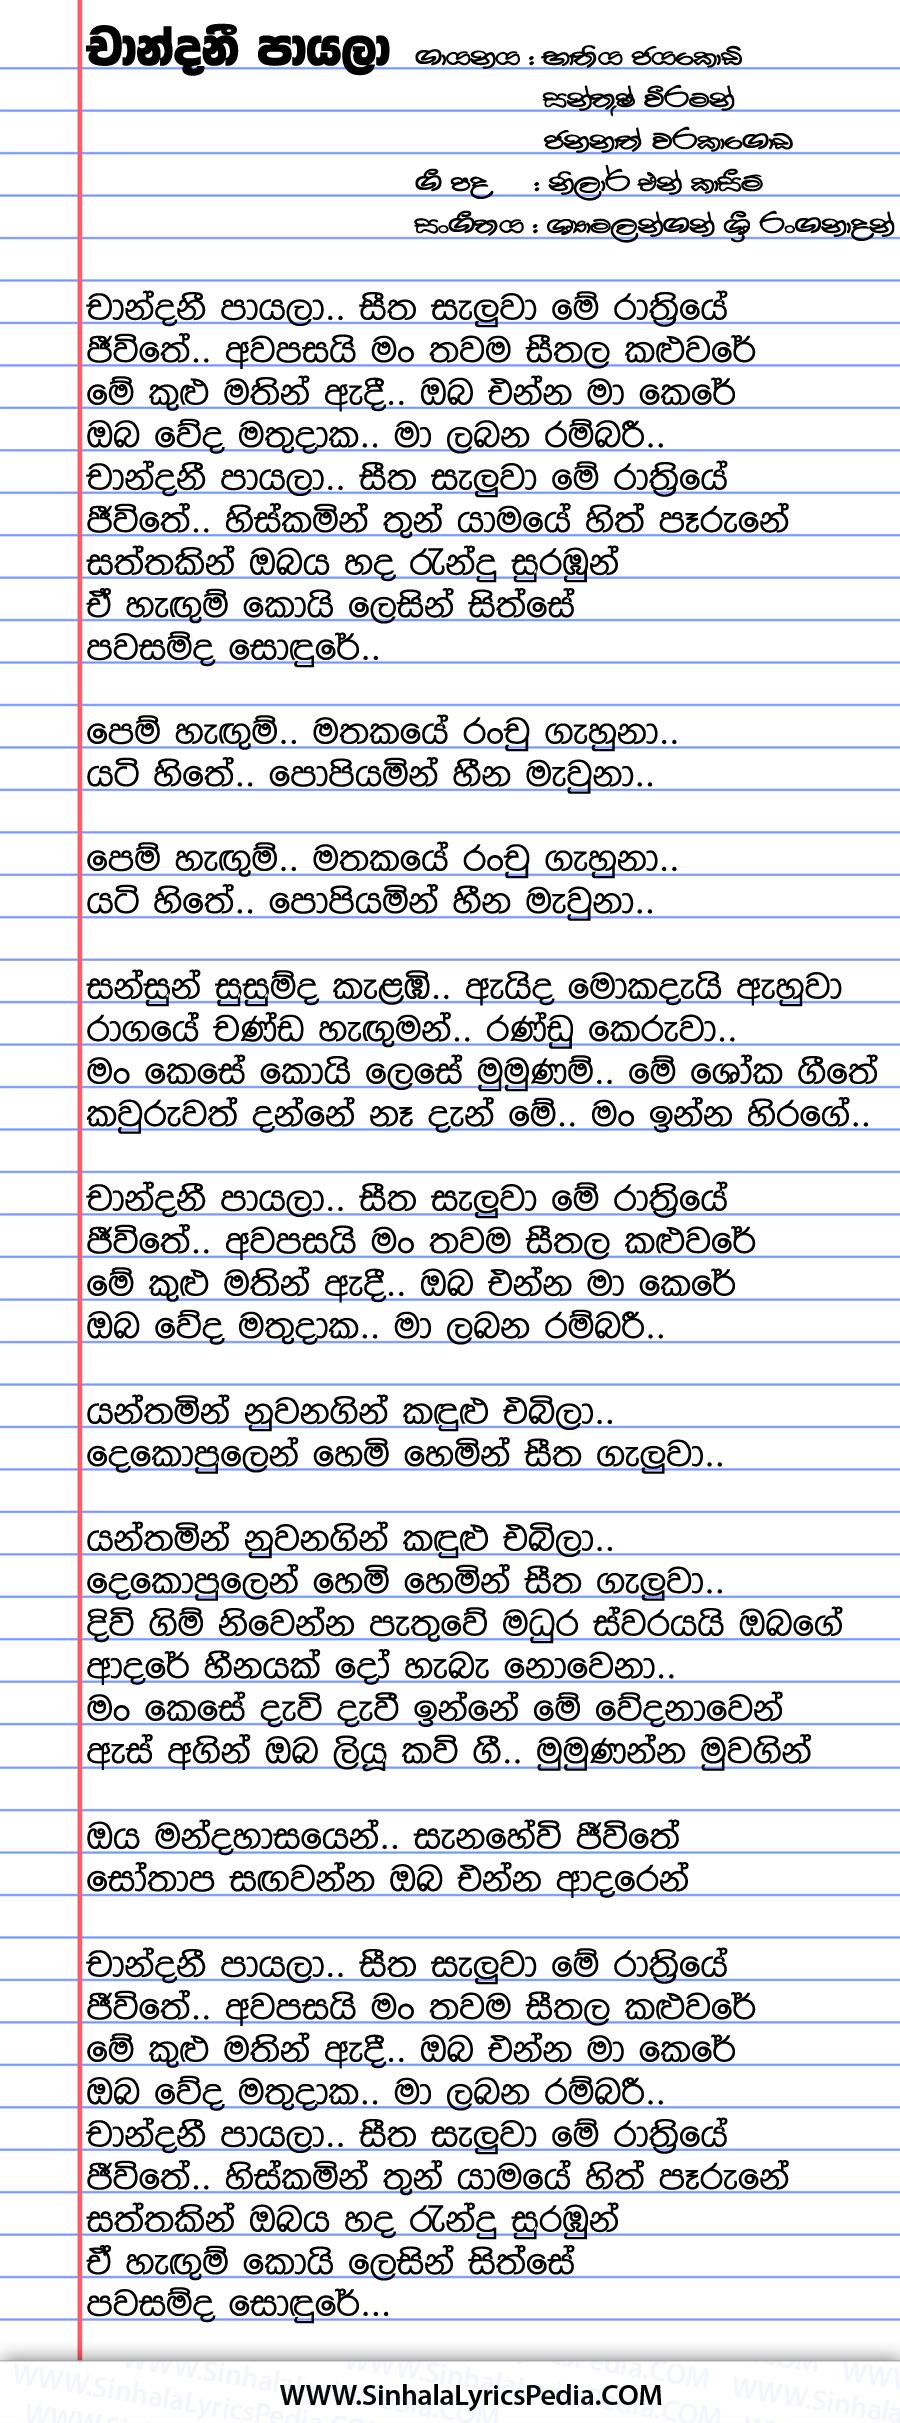 Chandani Payala Seetha Saluwa Me Rathriye Song Lyrics